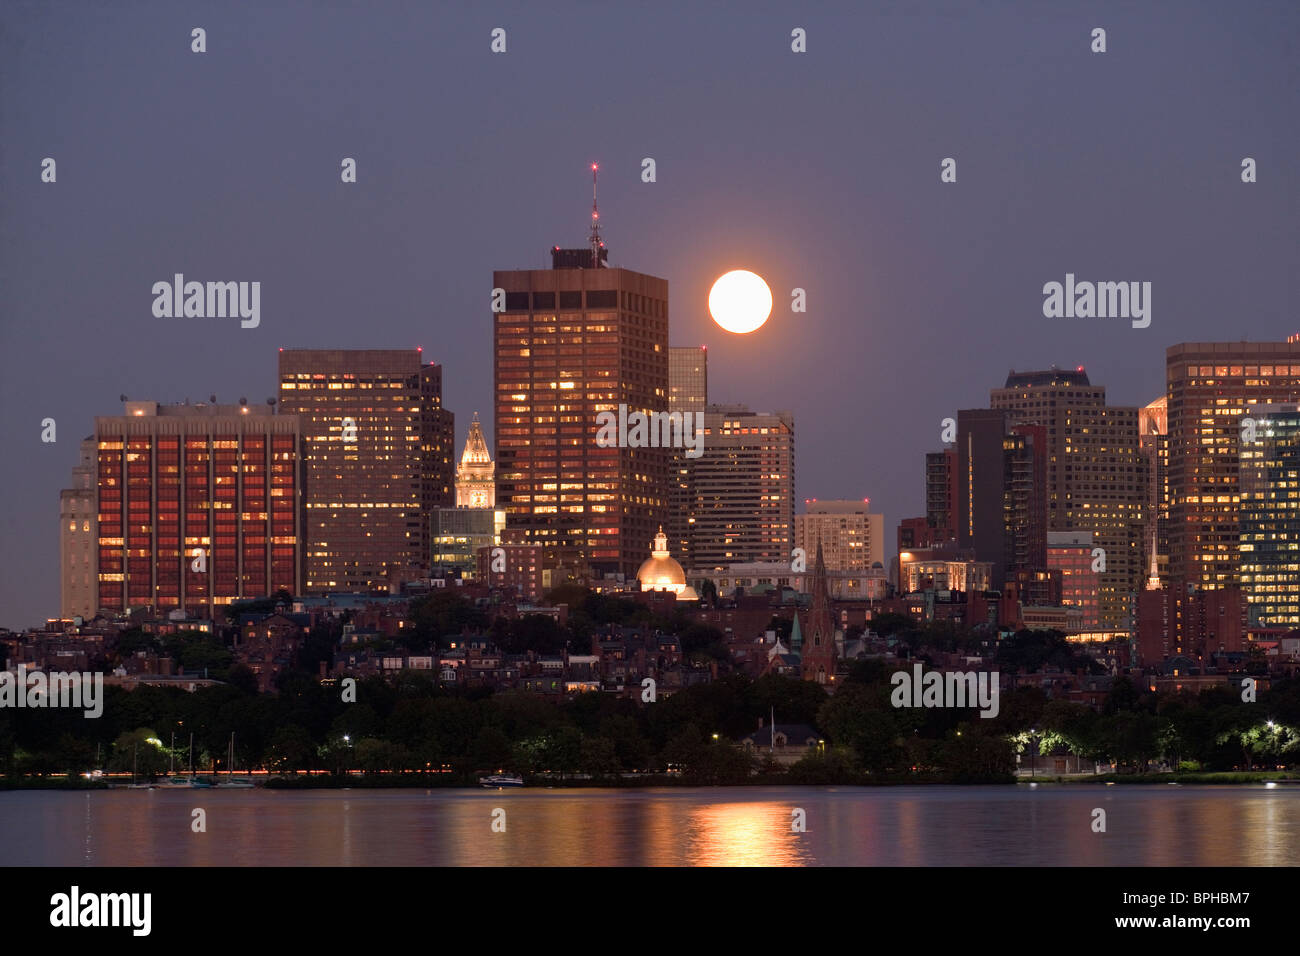 Full moon over city, Charles River, Beacon Hill, Boston, Suffolk County, Massachusetts, USA - Stock Image